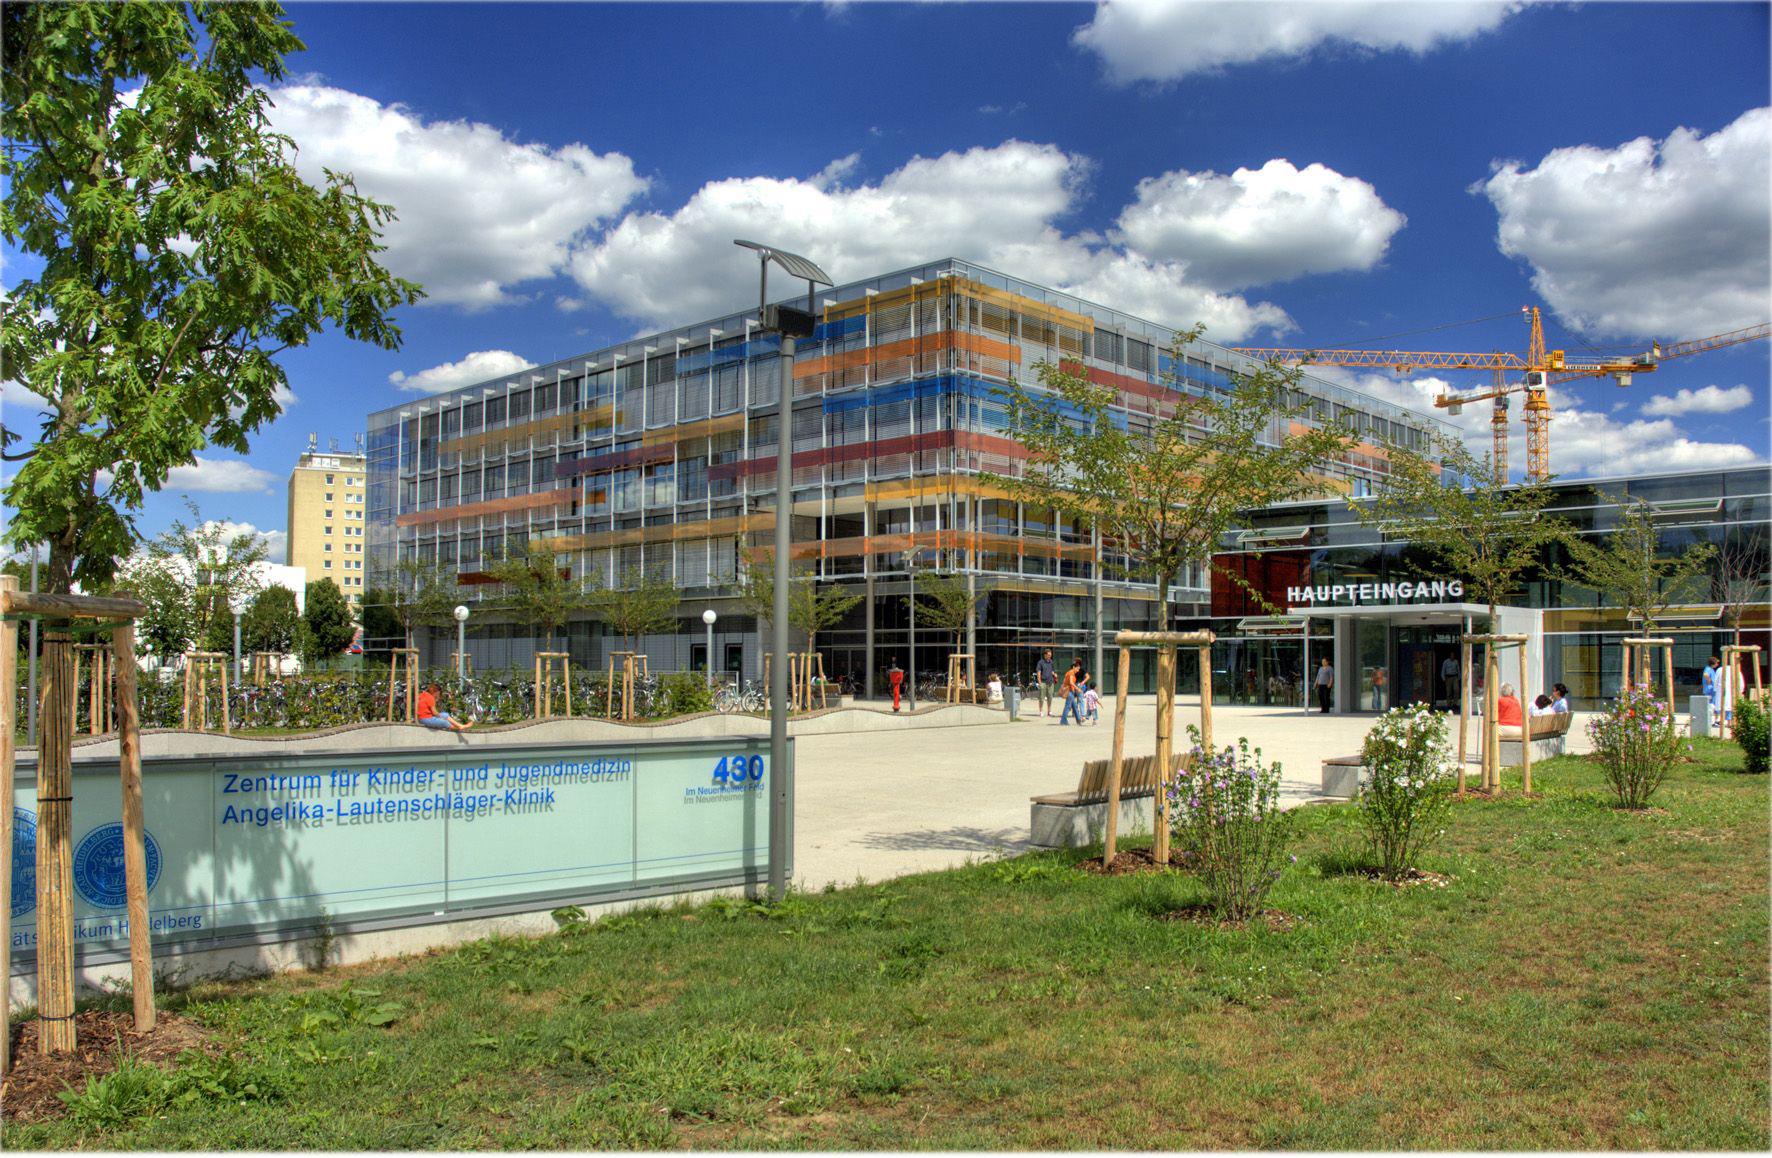 Heidelberg University Hospital (photo: Heidelberg University Hospital)